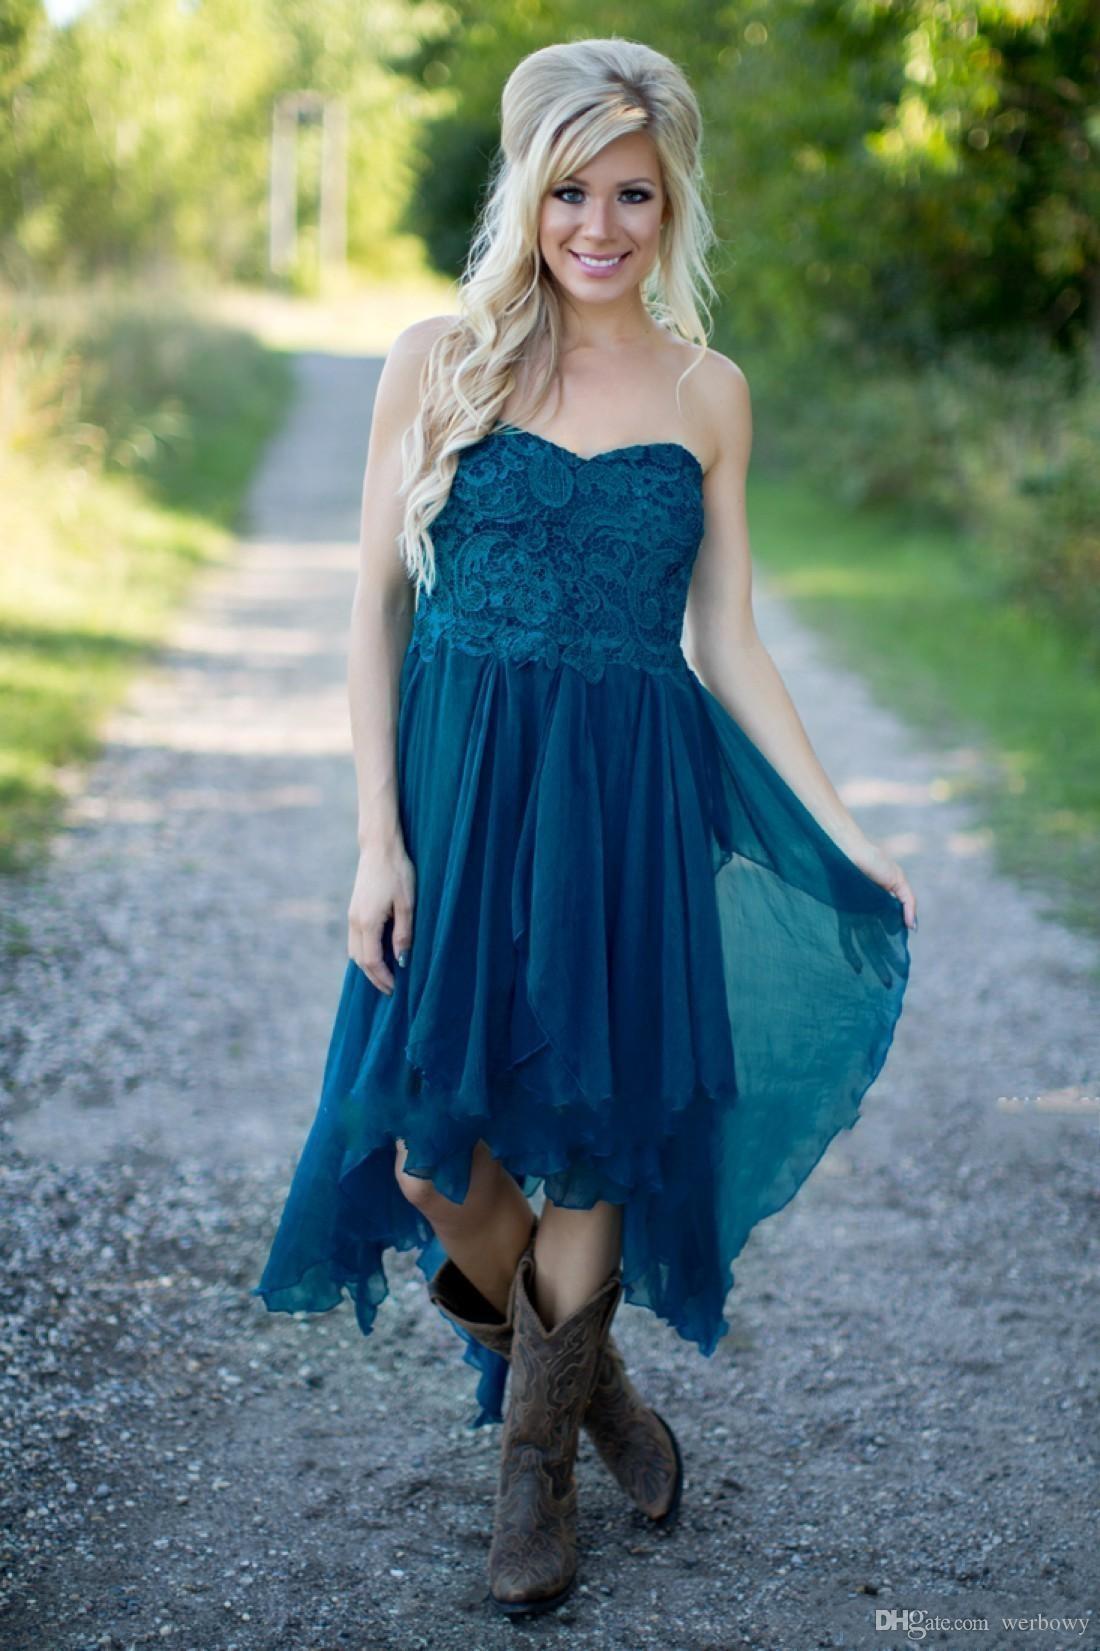 País Vestidos de dama de honor Cortos Hot Cheap For Wedding Teal Chiffon Beach Lace High Low Ruffles Party Maid Honor Gowns Under HY253